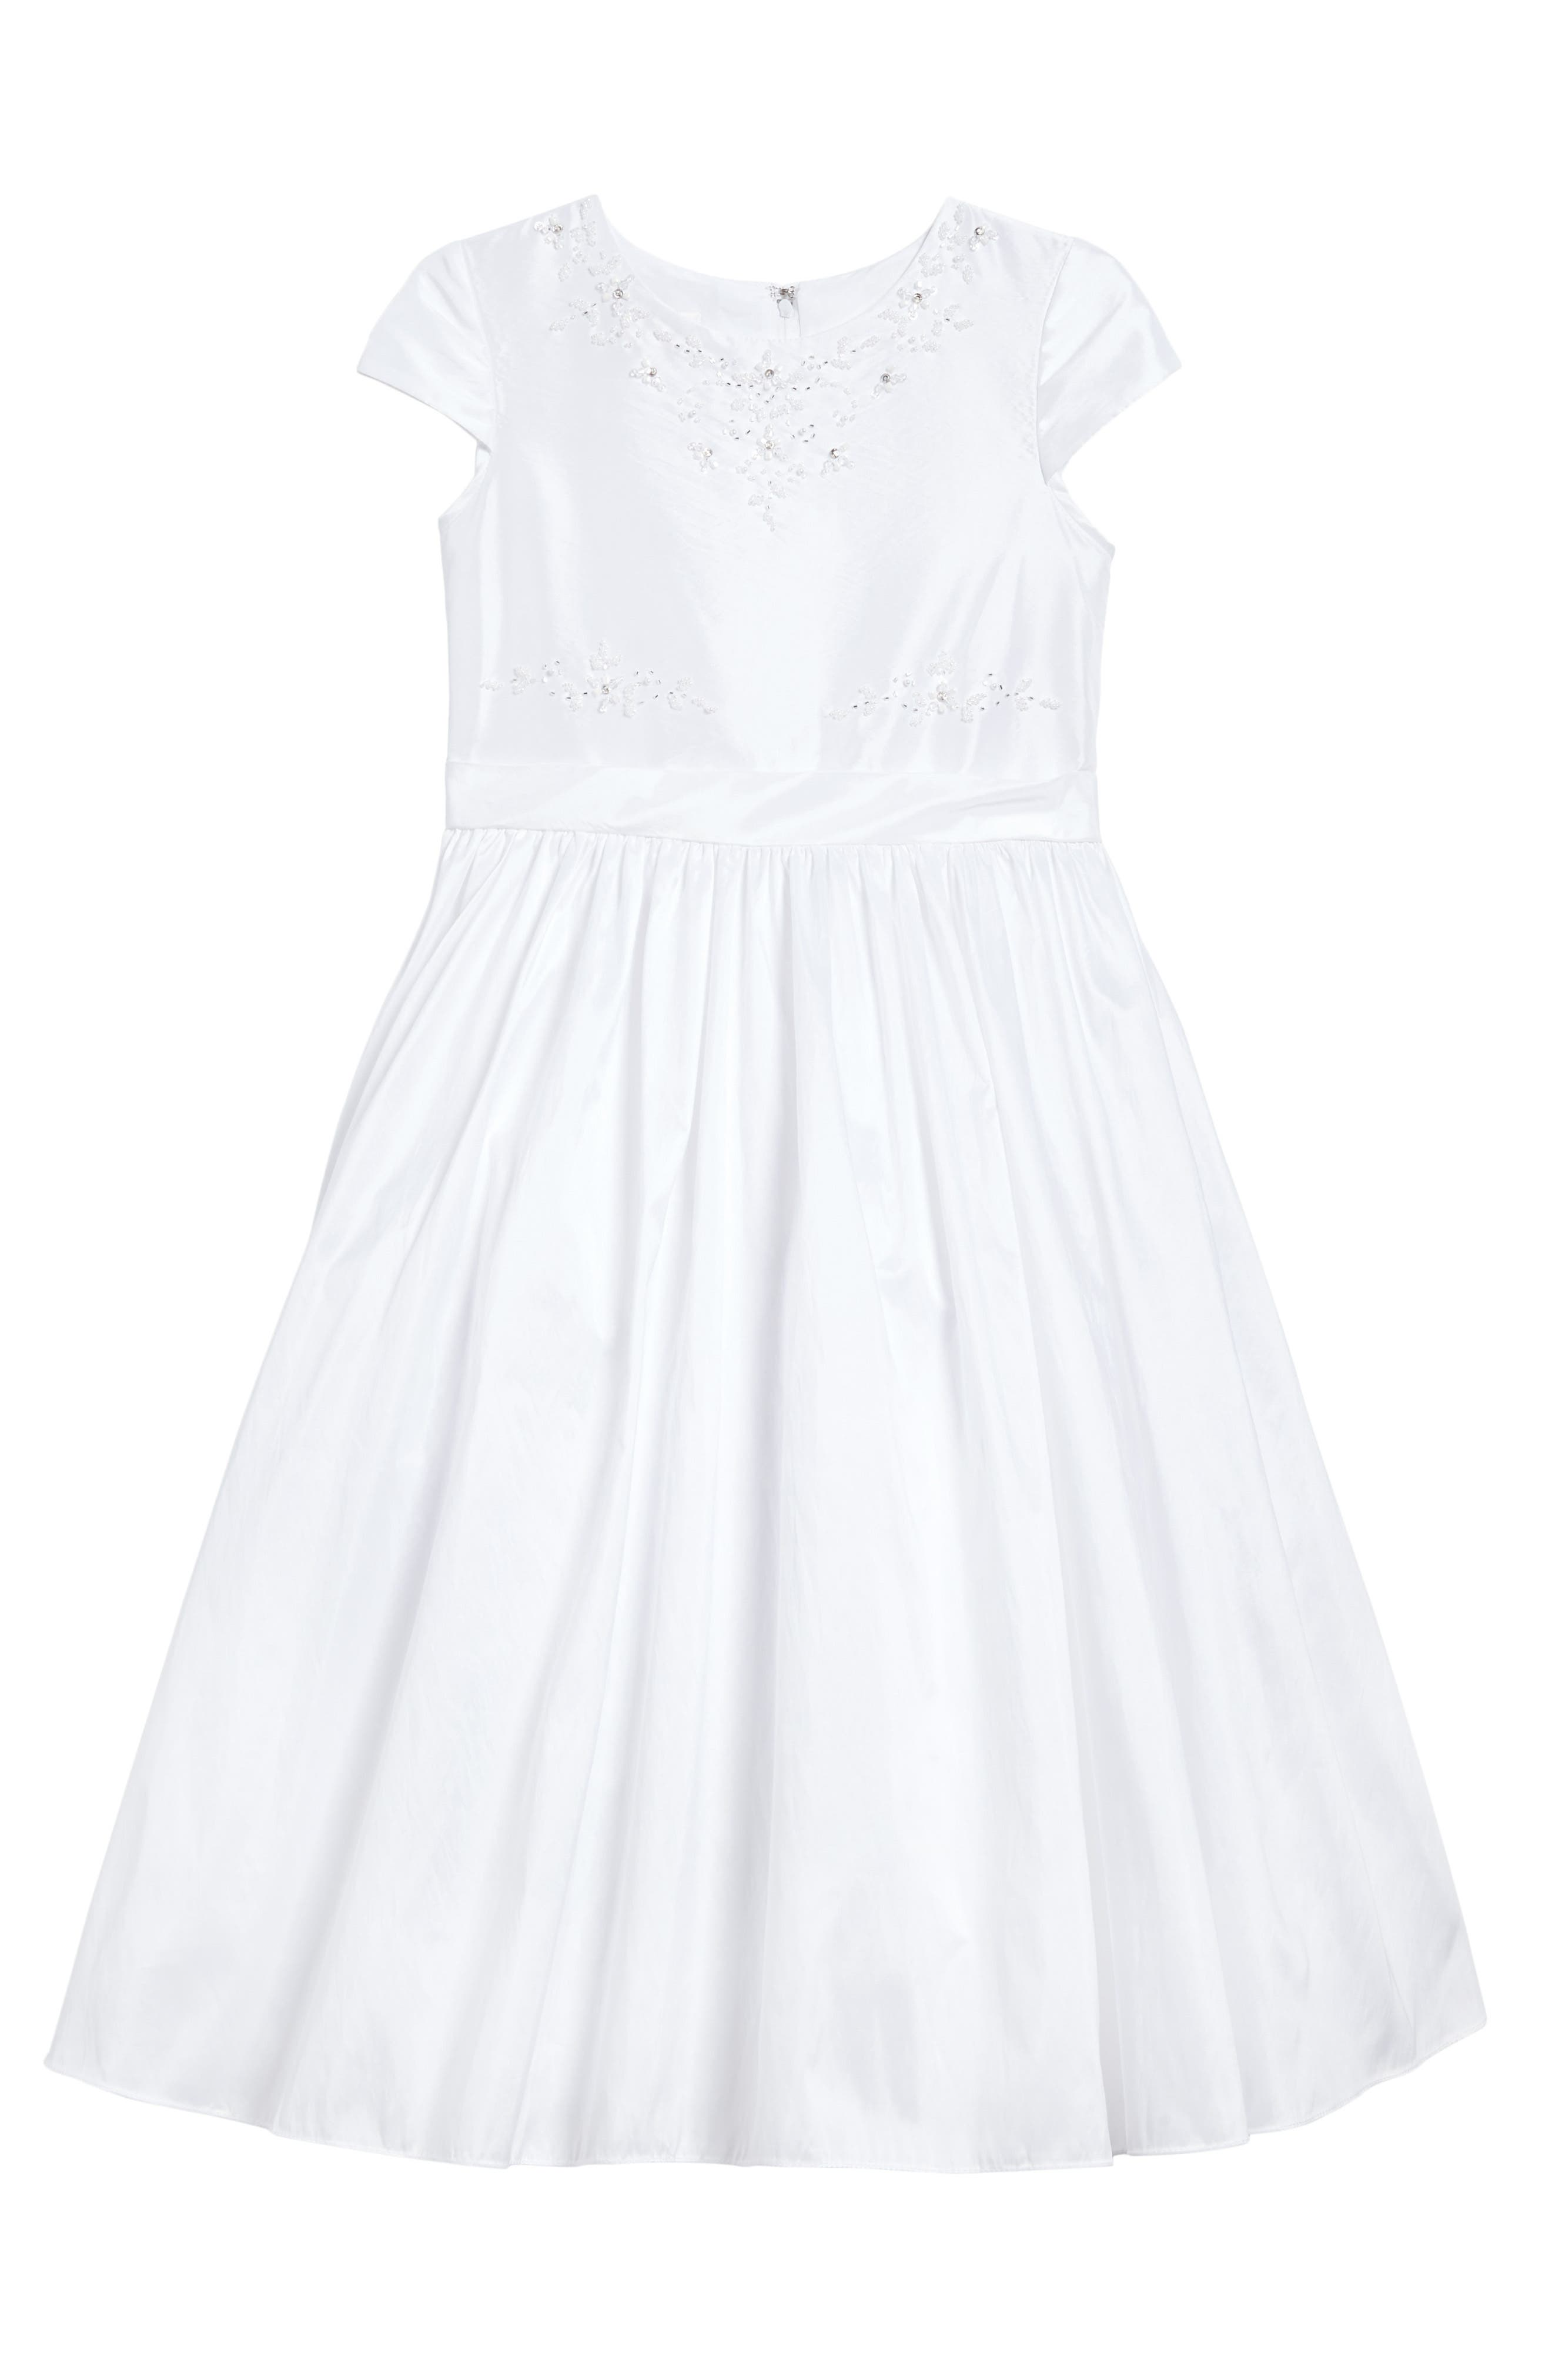 Beaded Taffeta First Communion Dress,                             Main thumbnail 1, color,                             100